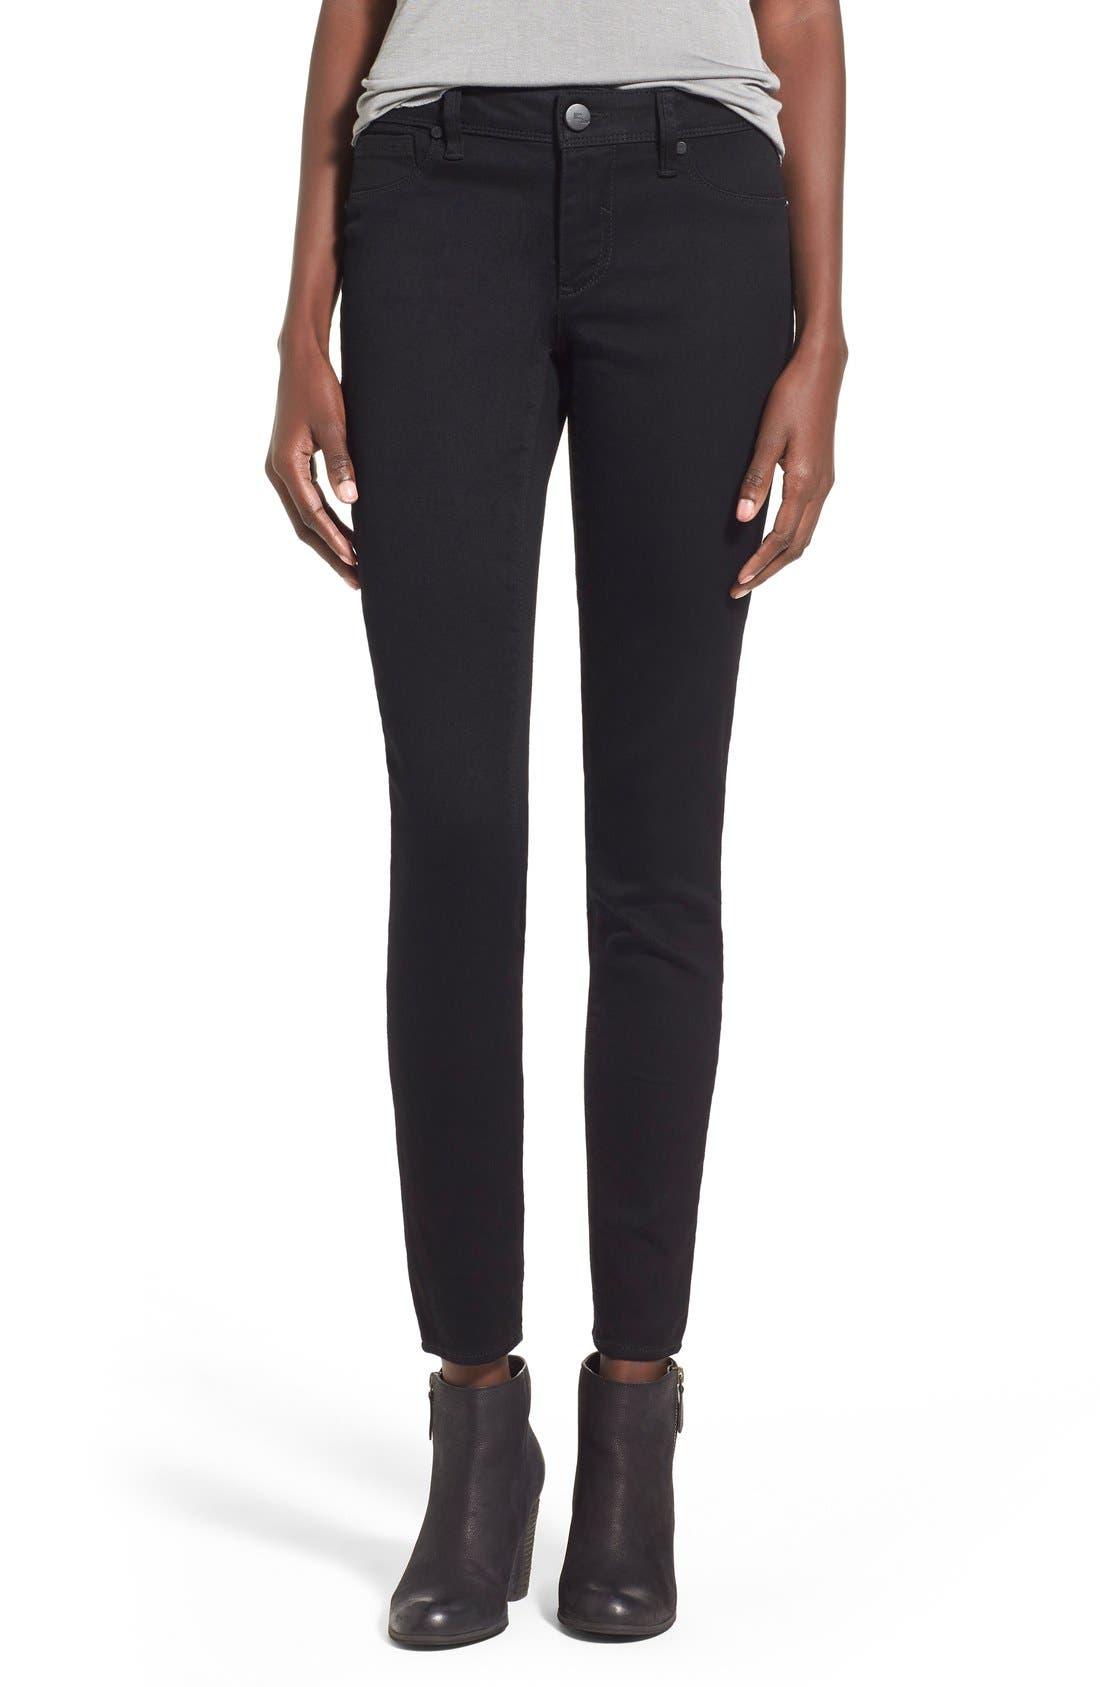 Butter Skinny Jeans,                             Main thumbnail 1, color,                             BLACK